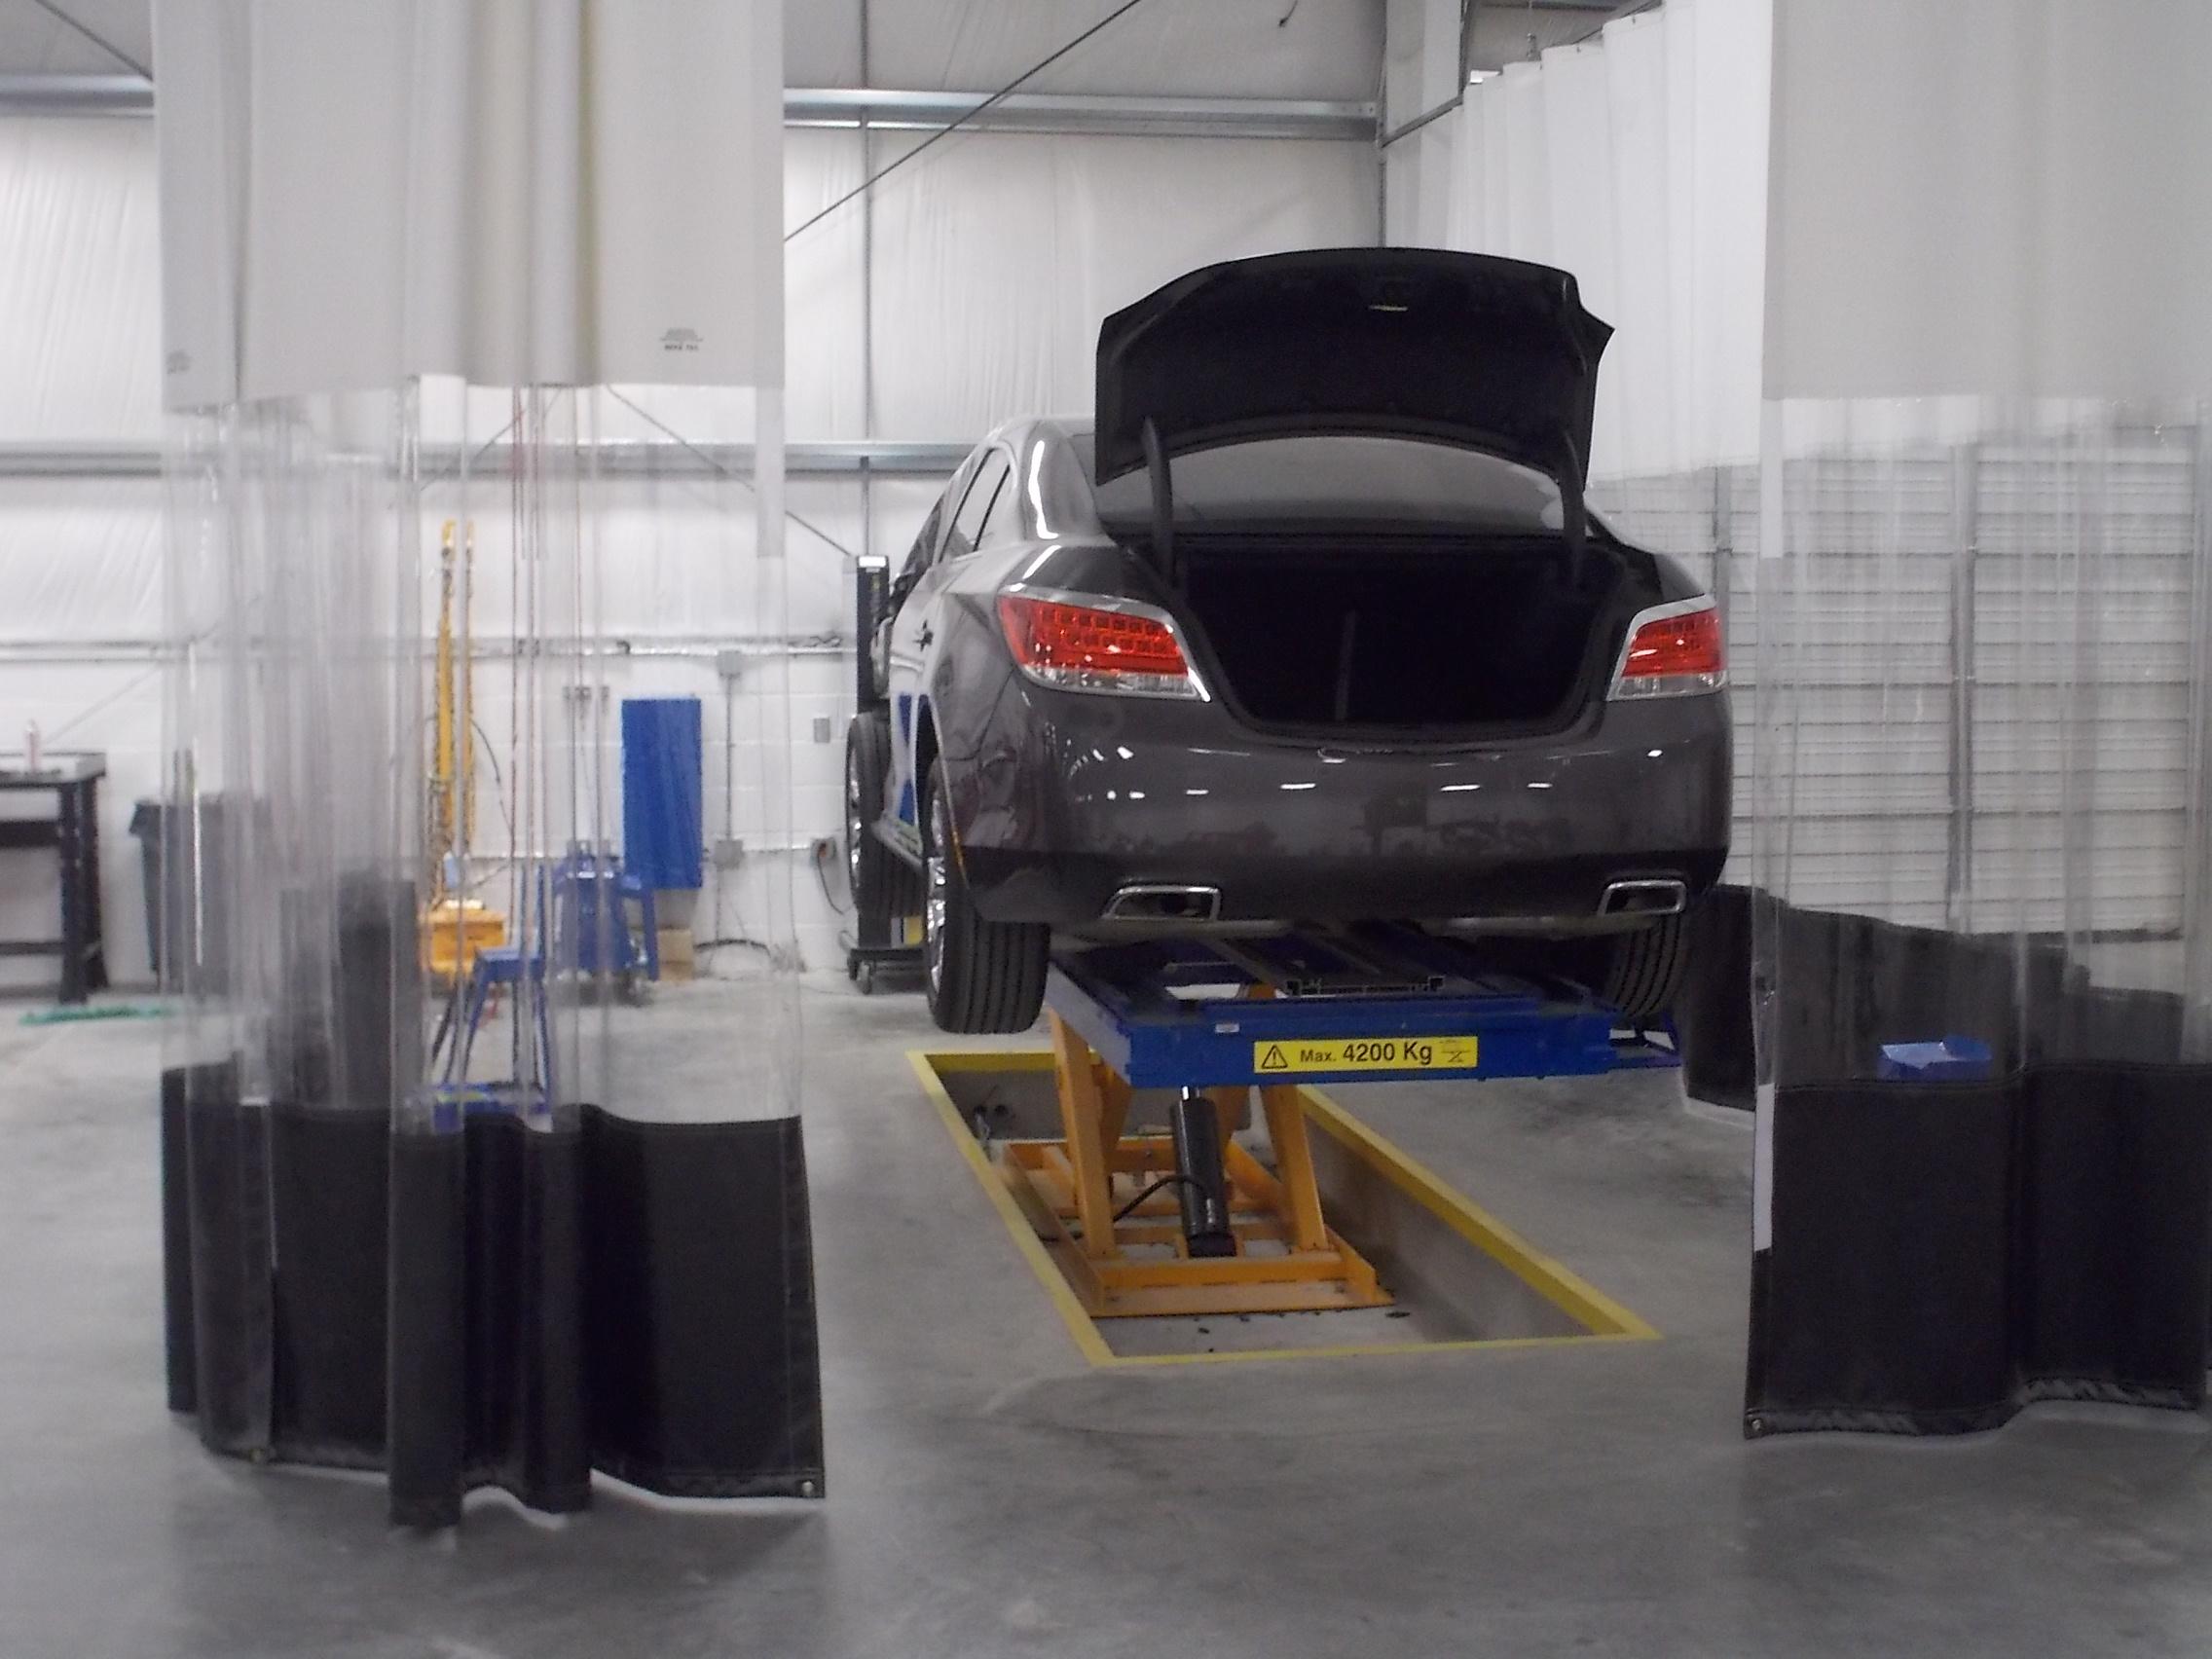 Shamaley Buick Gmc >> Shamaley Collision Center of El Paso, El Paso Texas (TX) - LocalDatabase.com